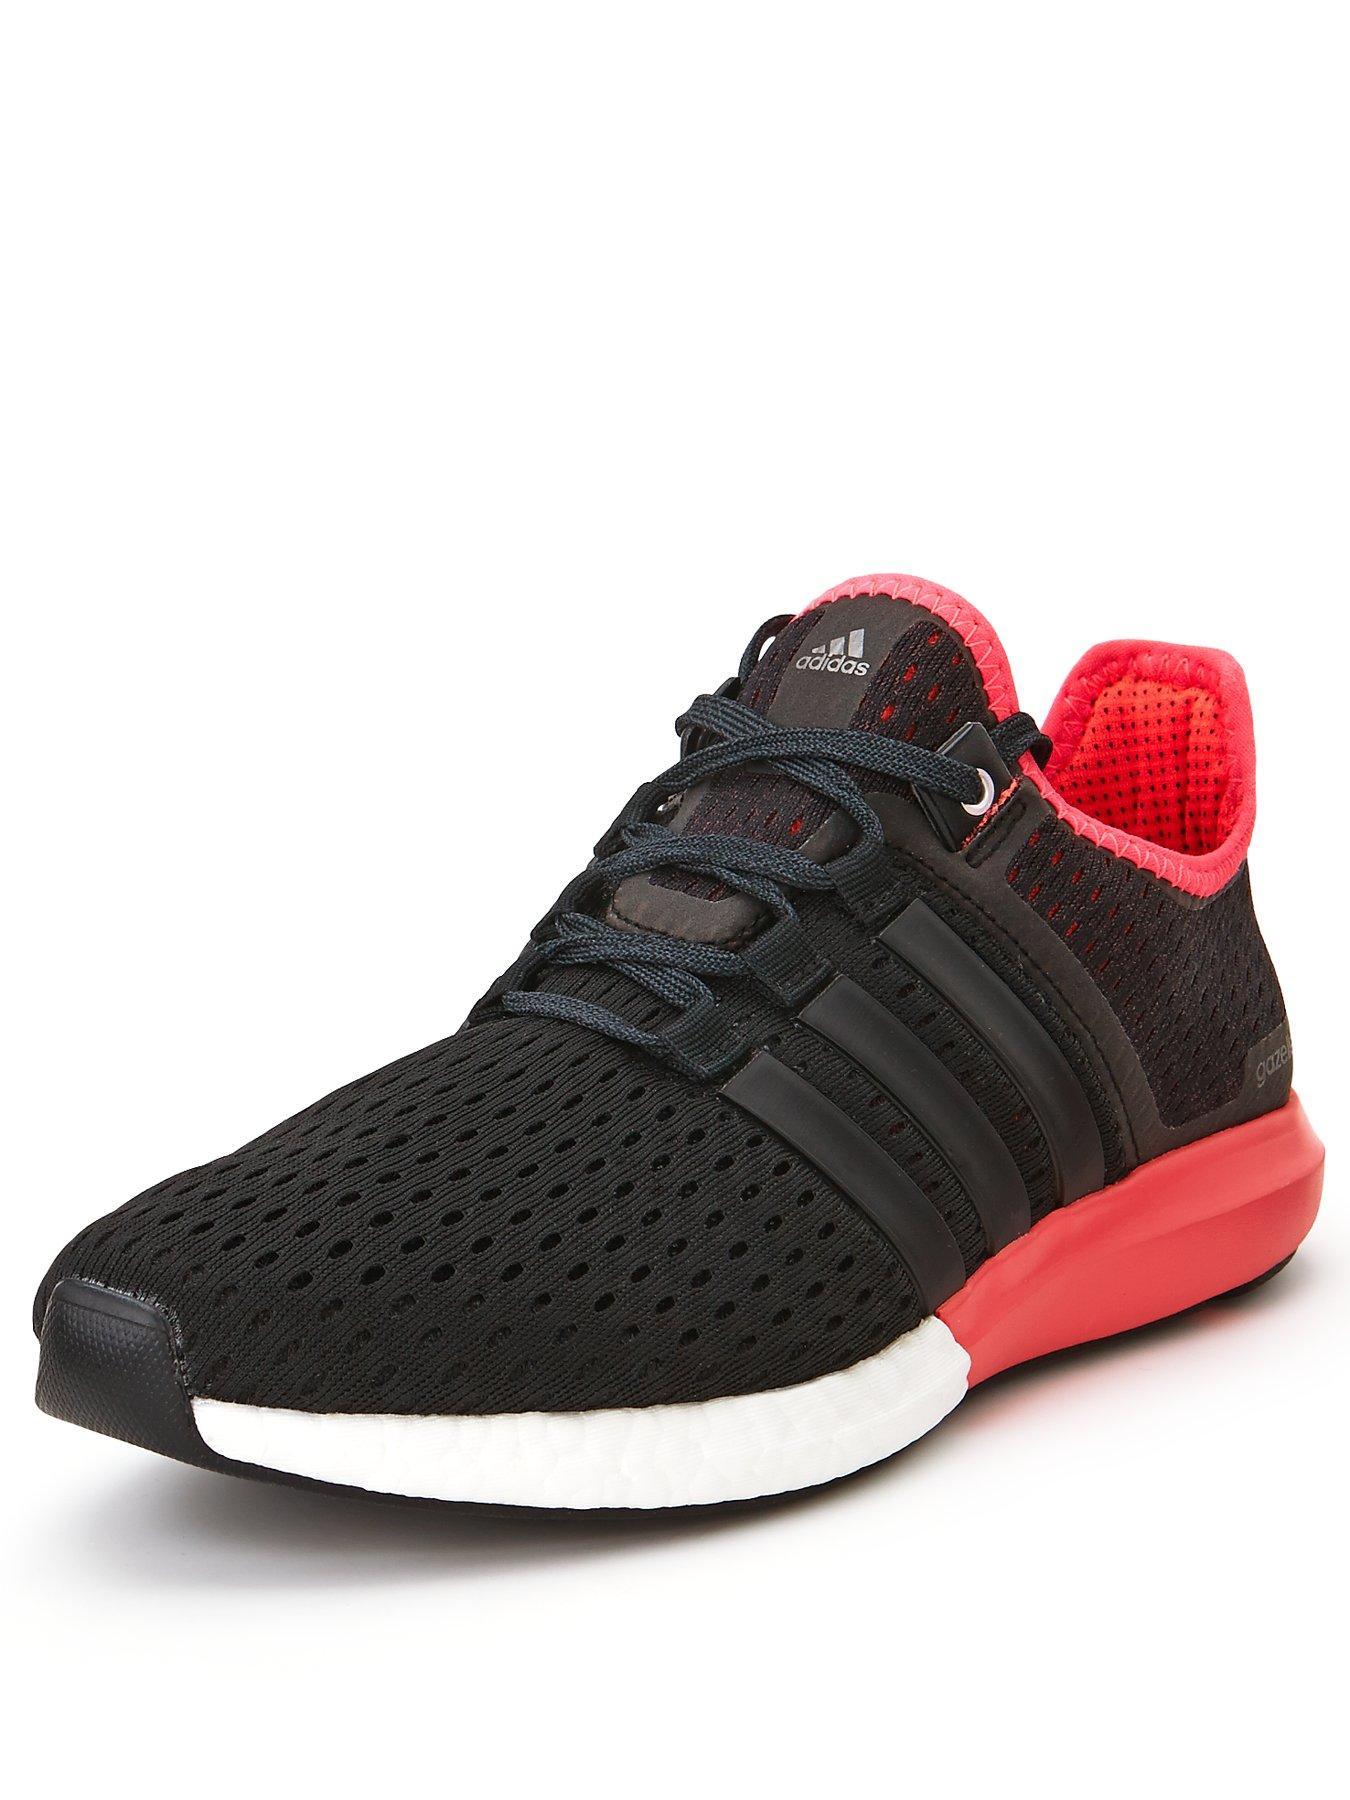 Adidas Gazelle Boost - Adidas Originals Gazelle Boost Trainers 1458095683.prd à Vendre